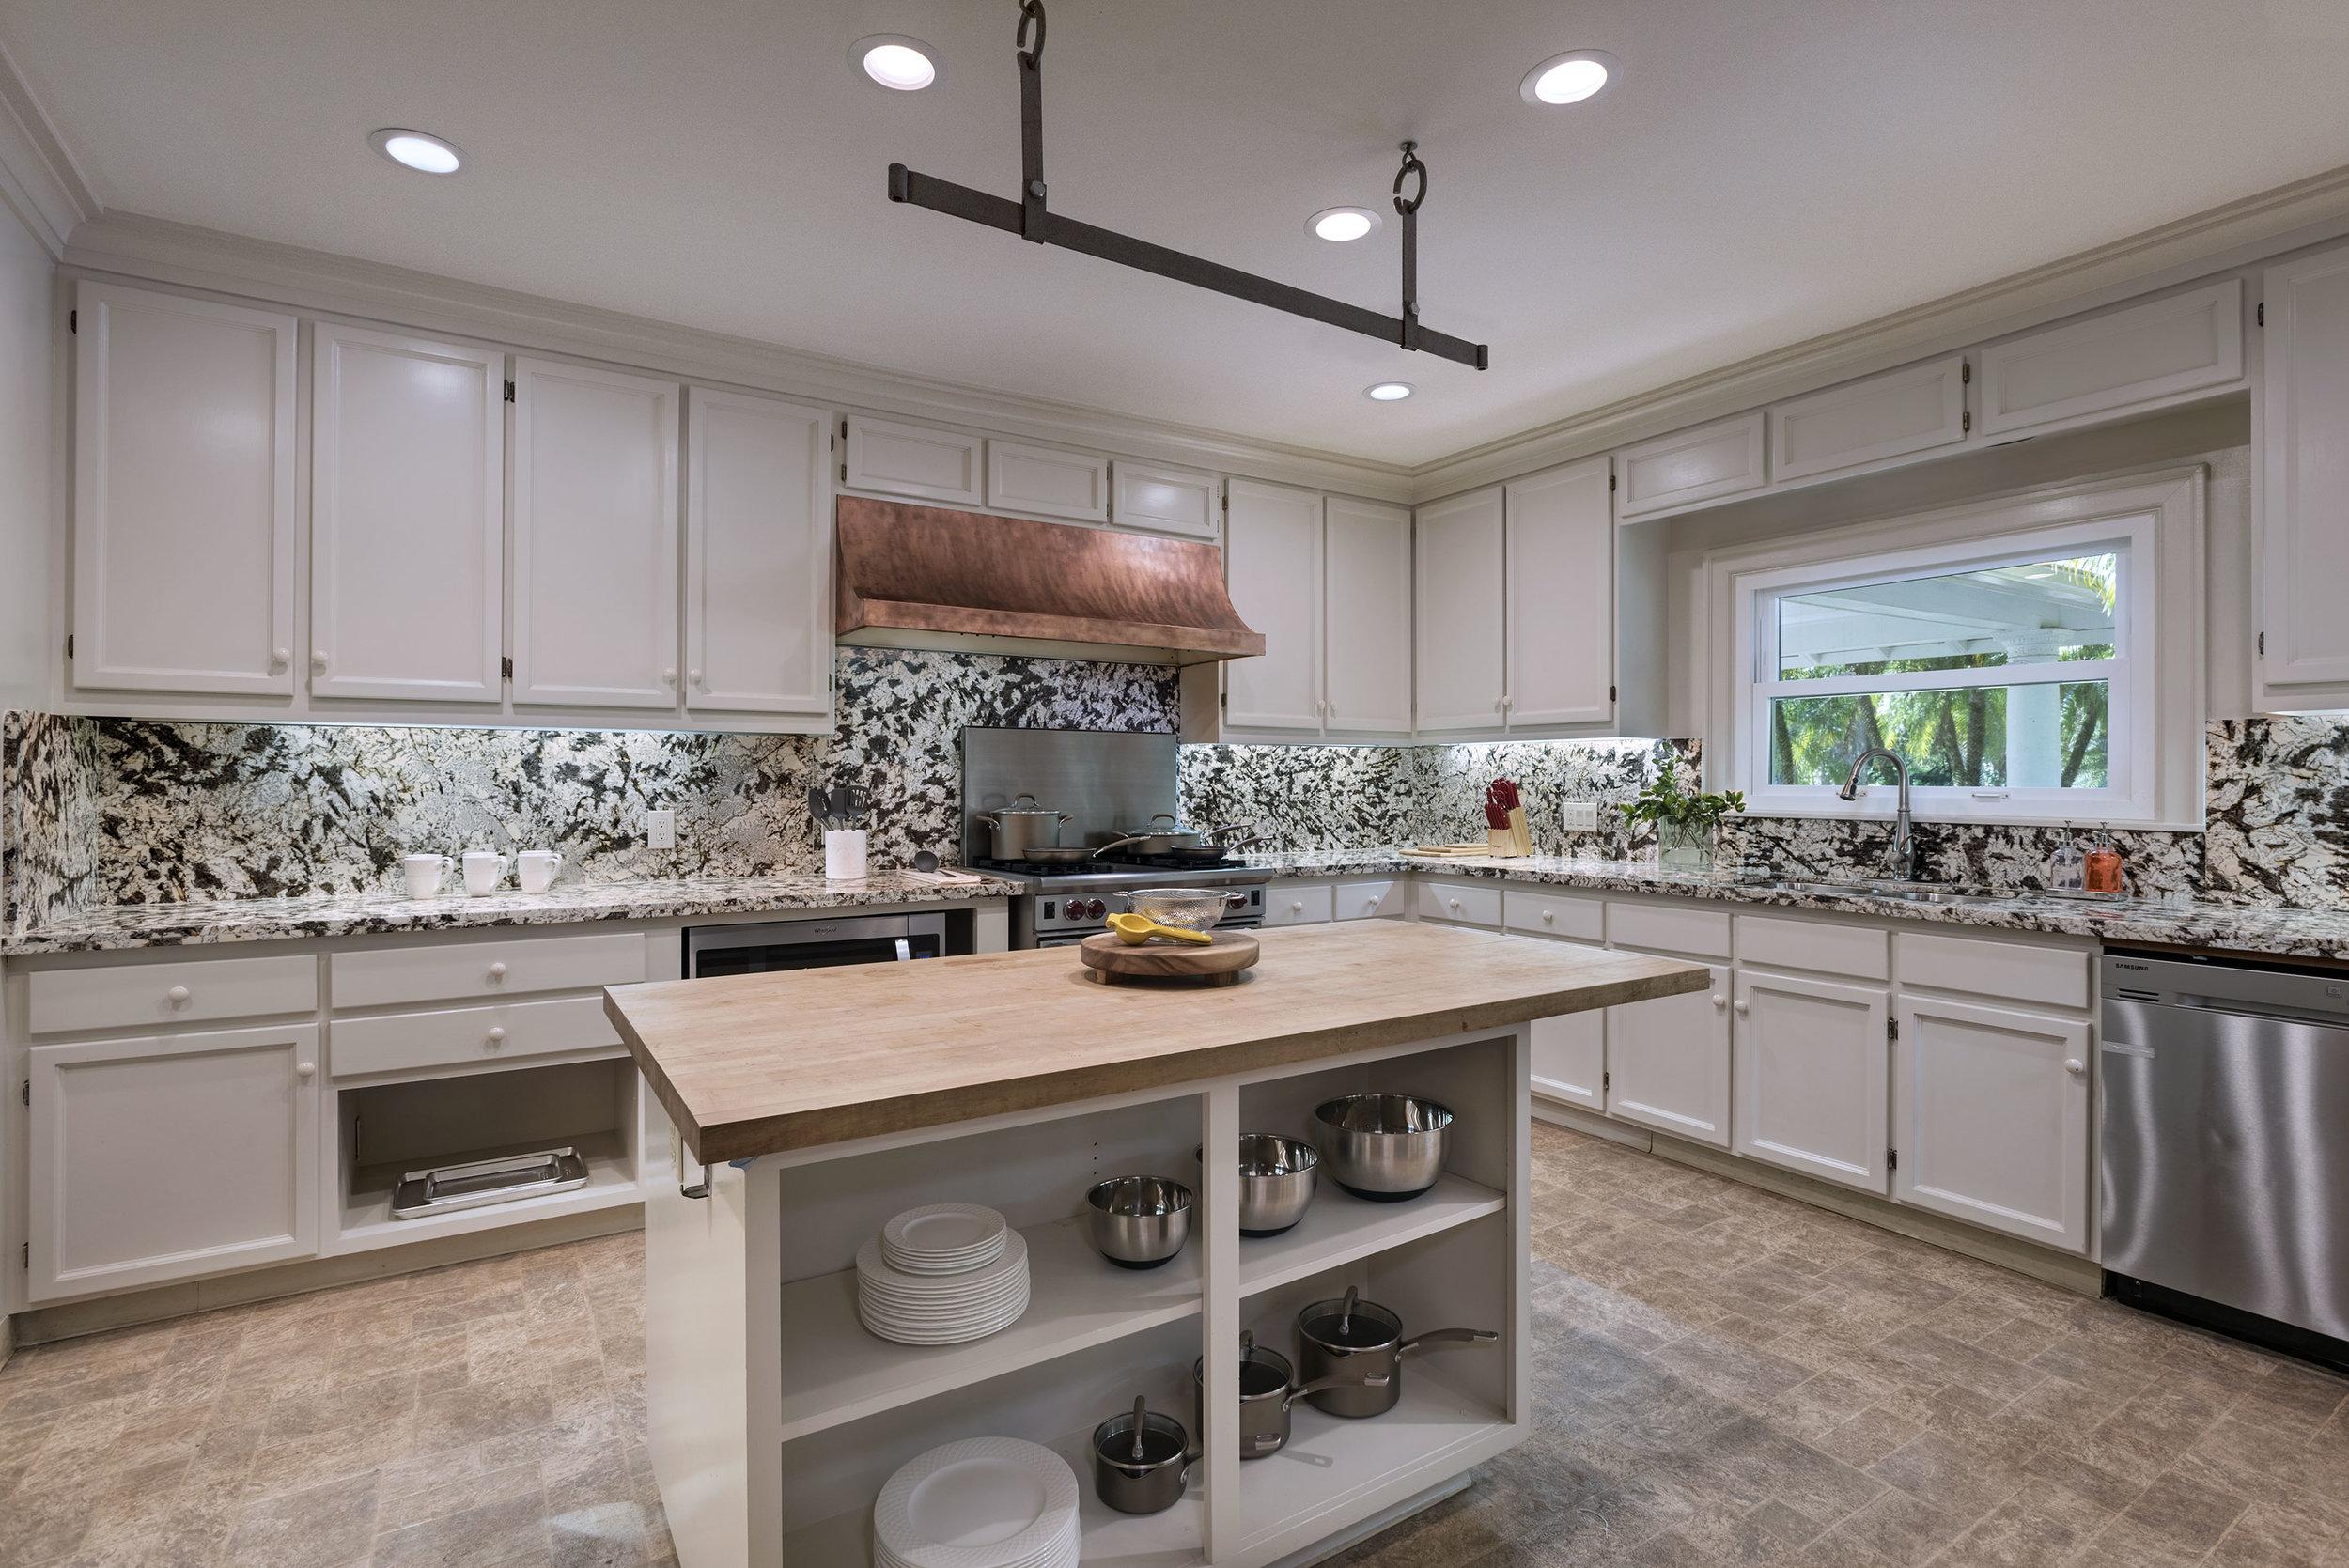 al-argueta-2018-PGH-kitchen-.jpg